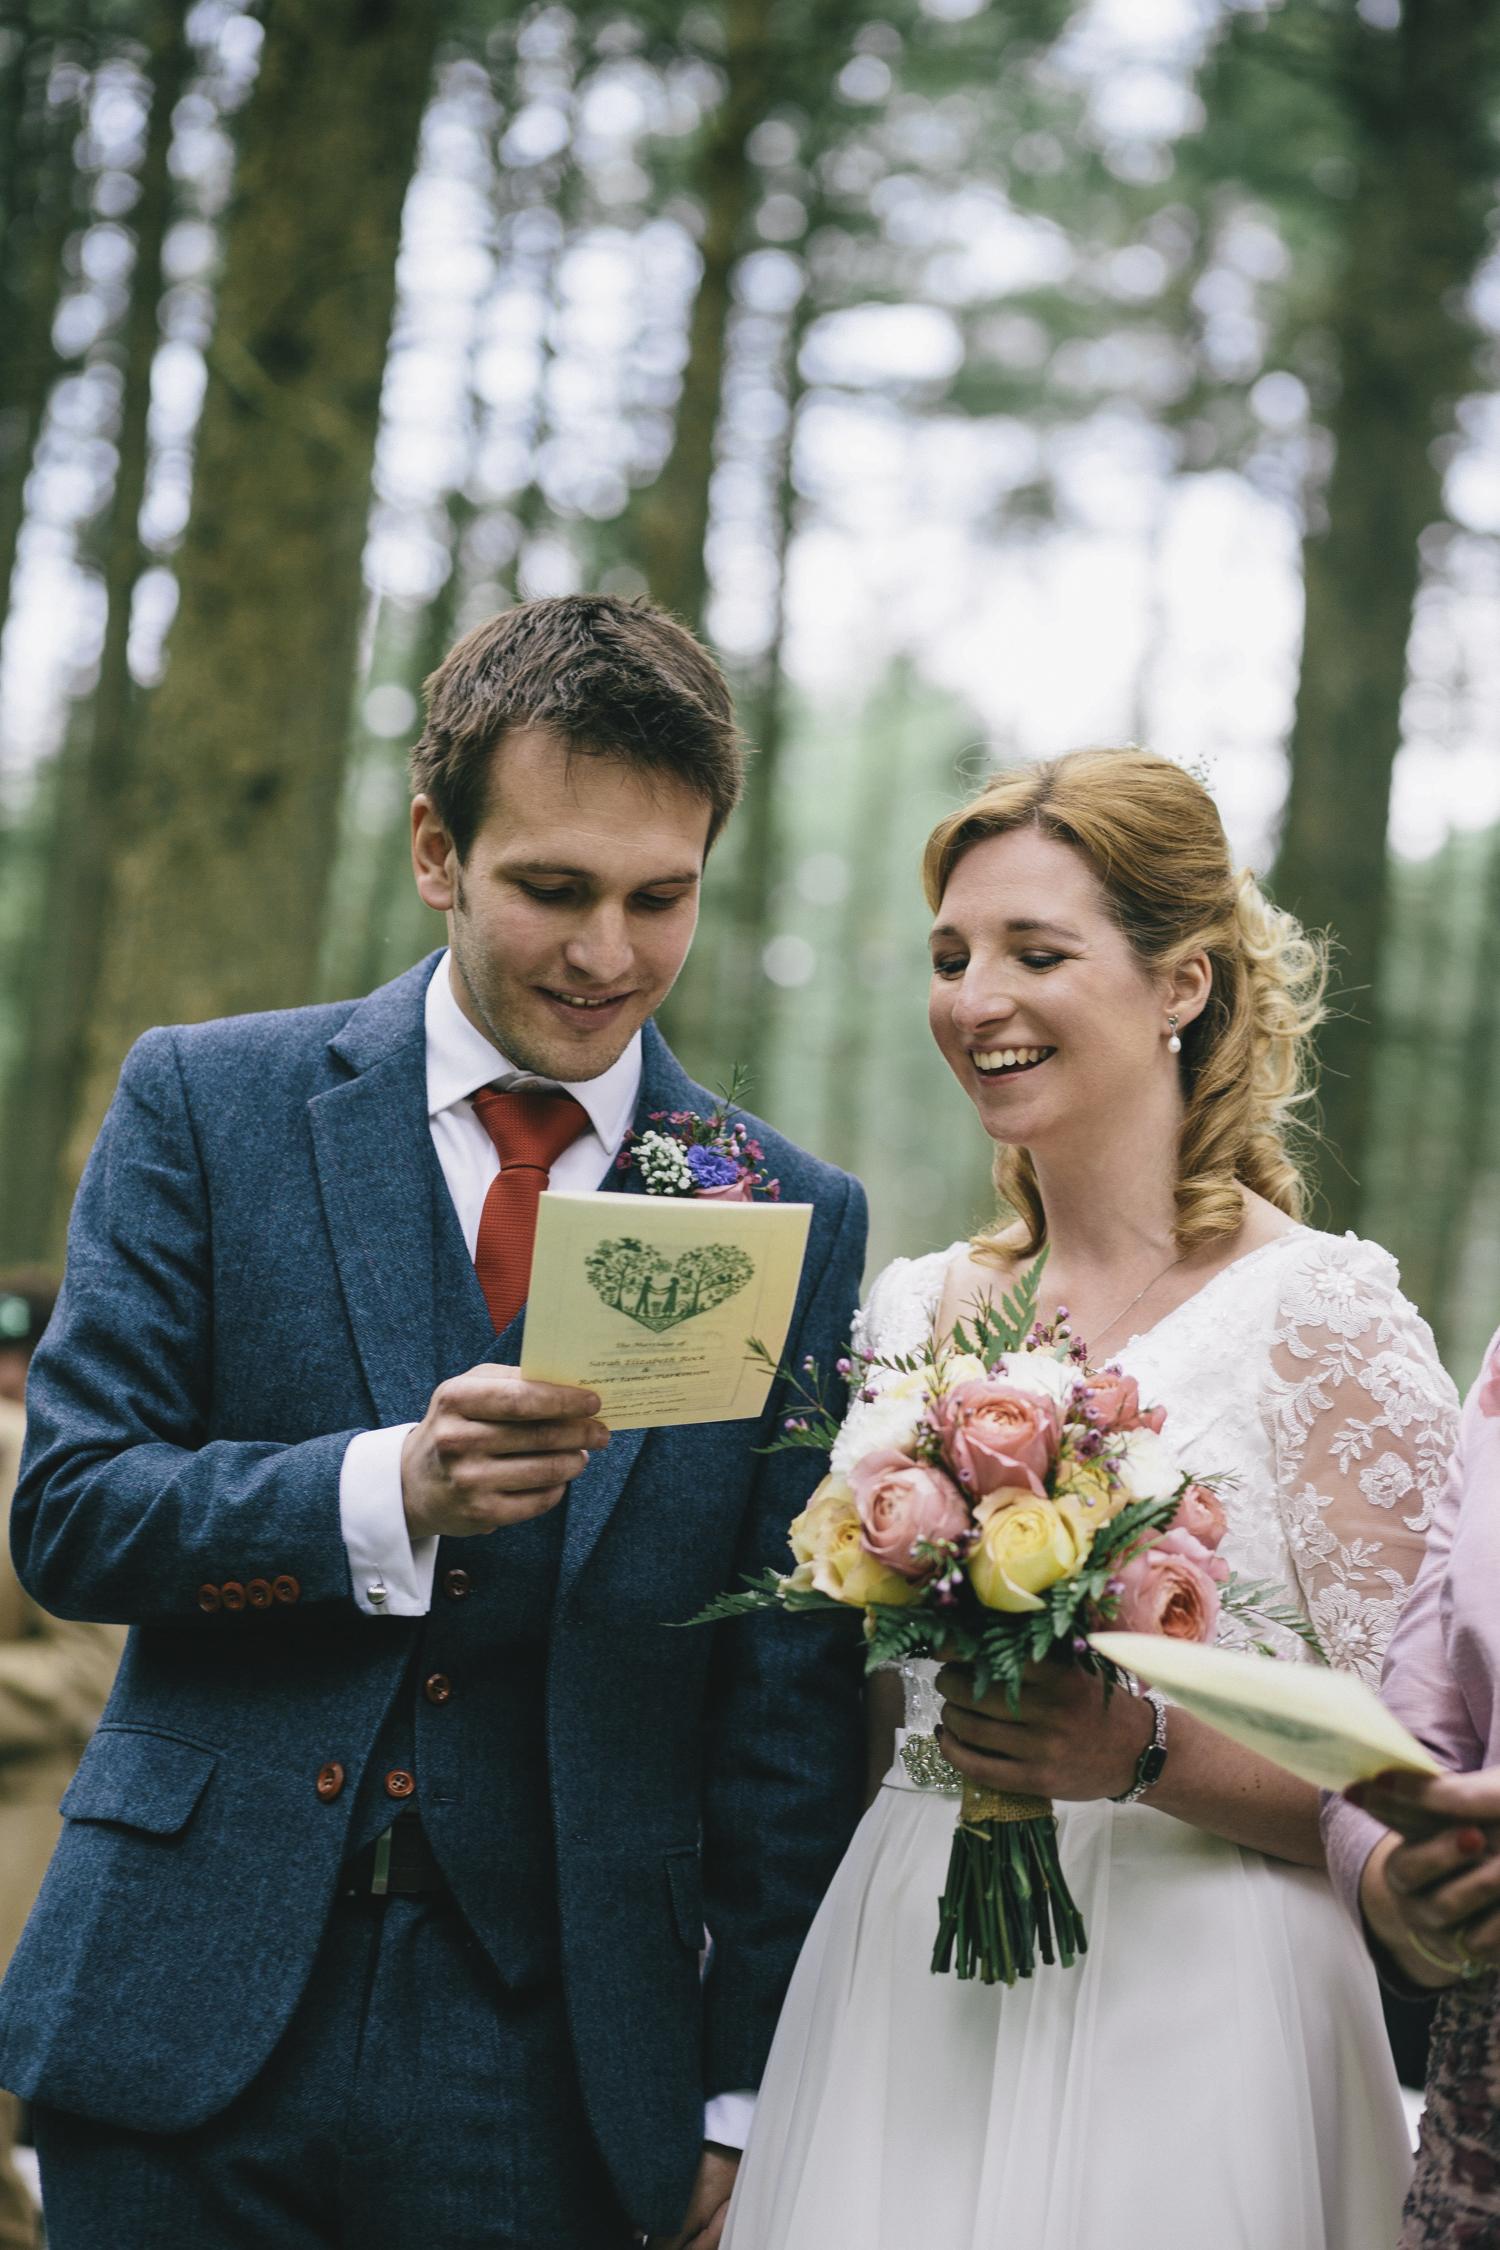 Alternative_wedding_photographer_scotland_borders_mabie_forest-33.jpg